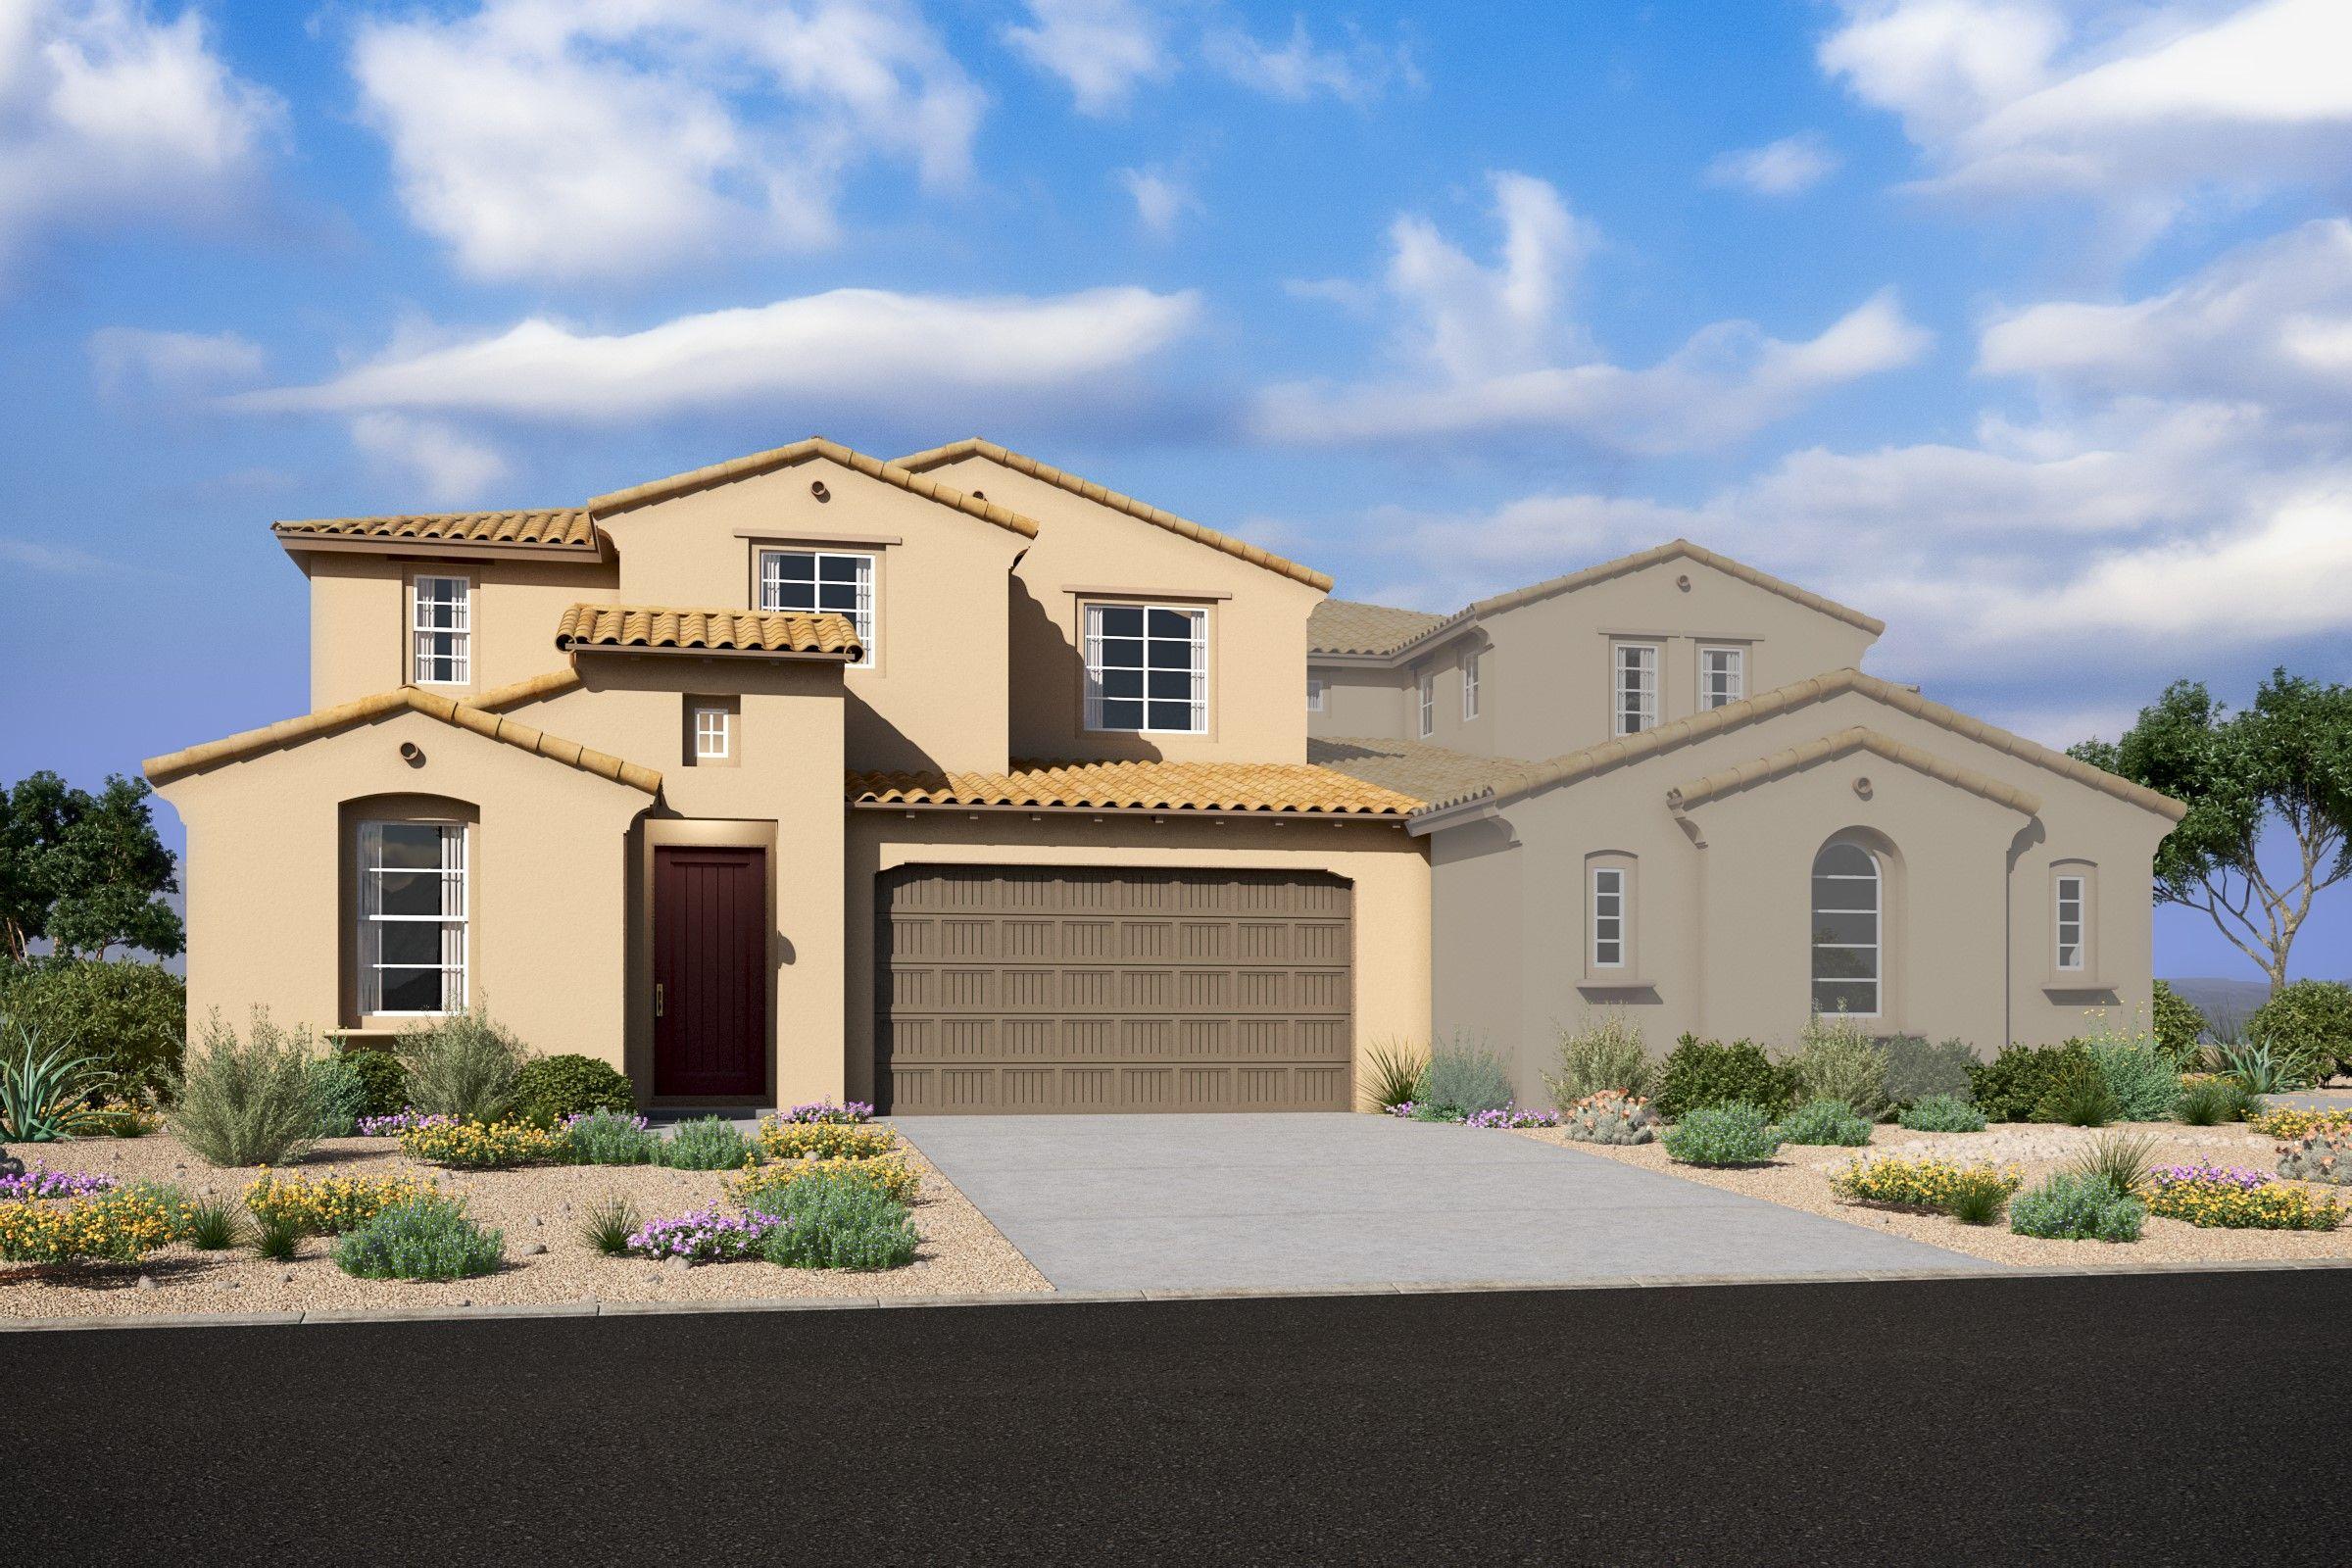 Multi Family للـ Sale في Summit At Silverstone - Meridian 74th St And Pinnacle Peak Rd Scottsdale, Arizona 85255 United States